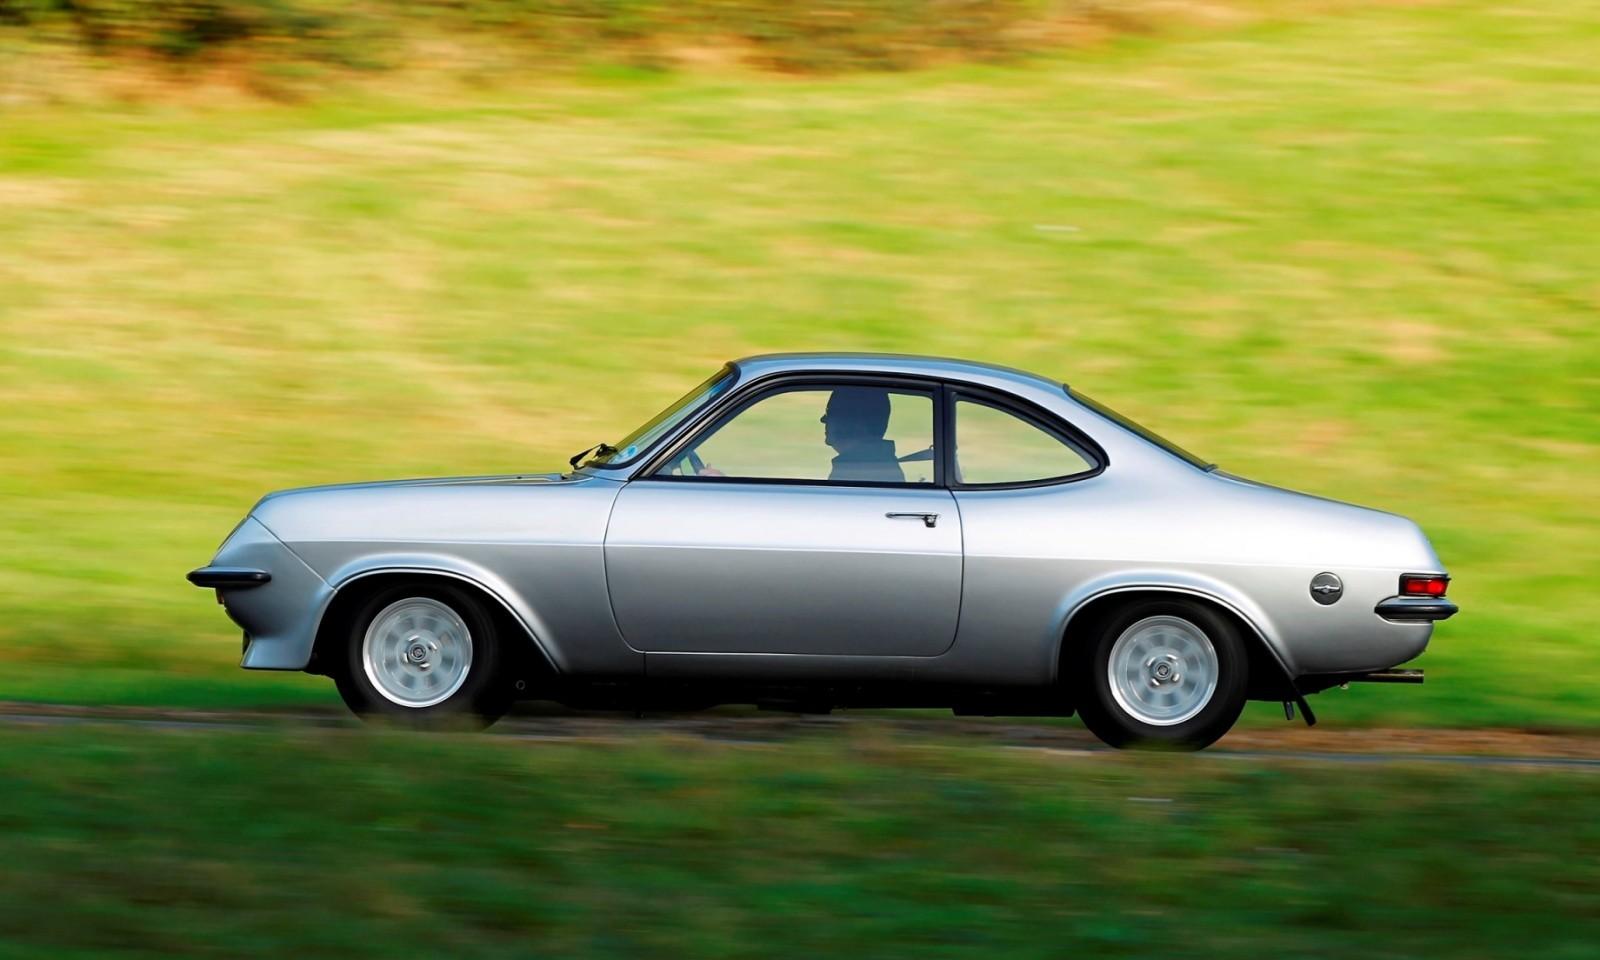 1973 Vauxhall Firenza 44